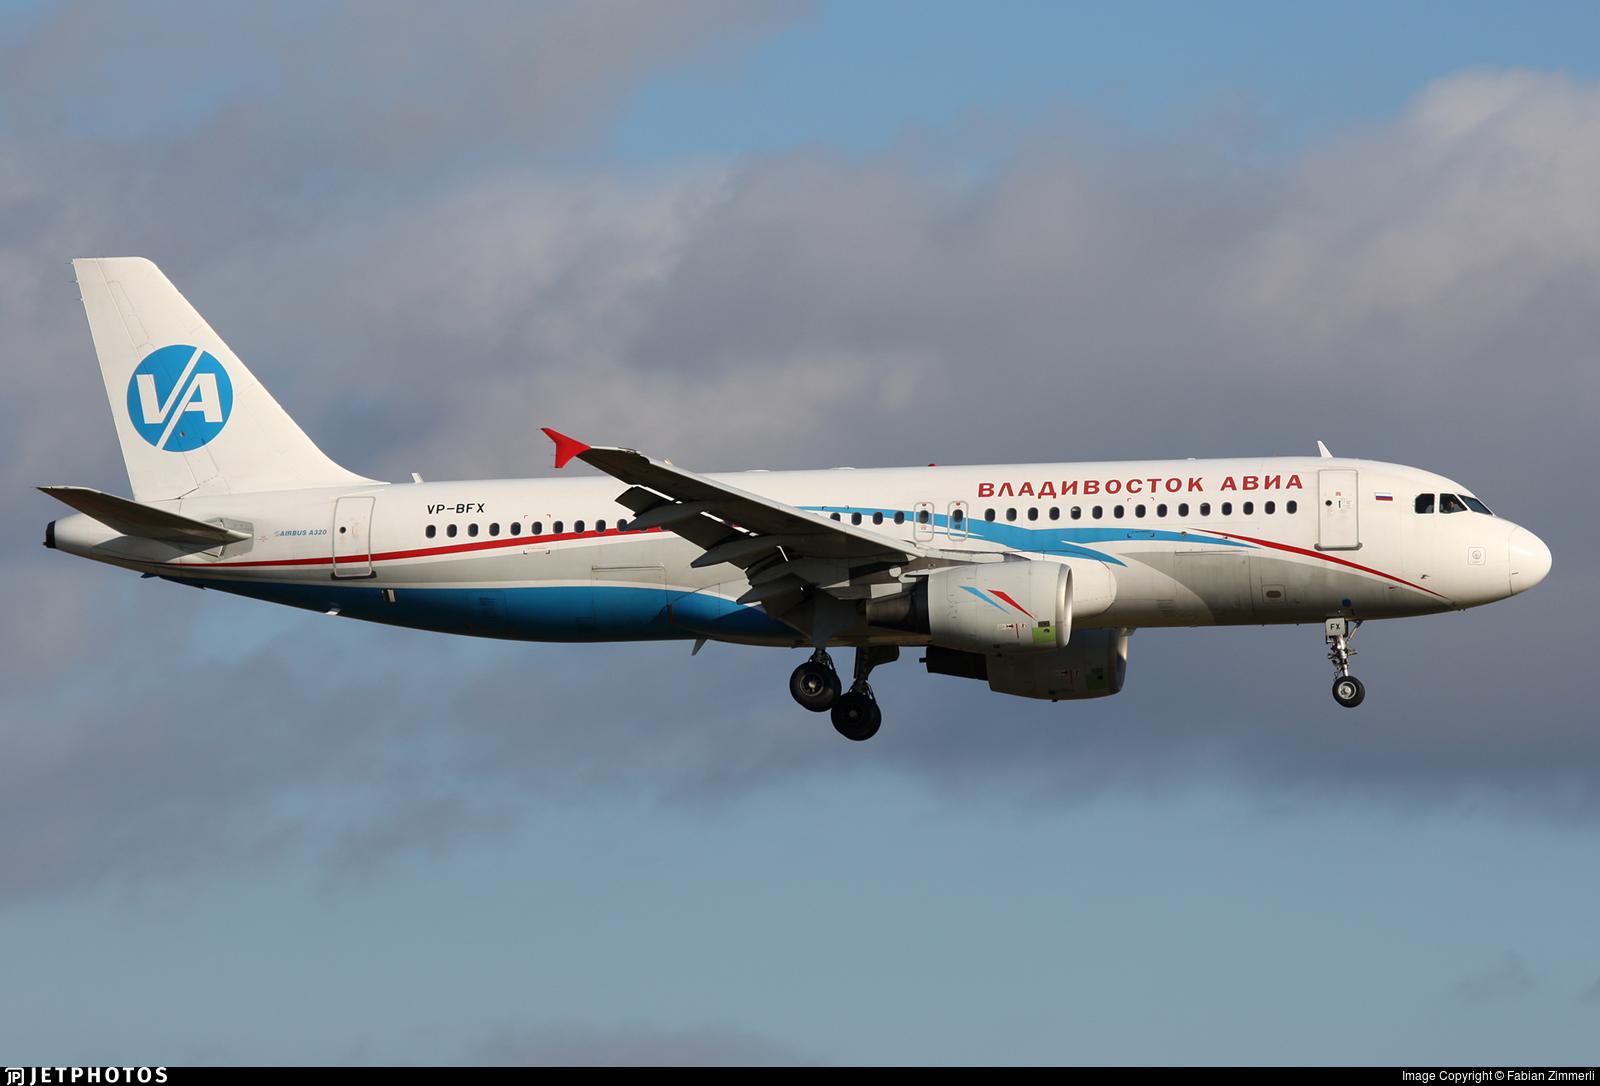 VP-BFX - Airbus A320-214 - Vladivostok Air